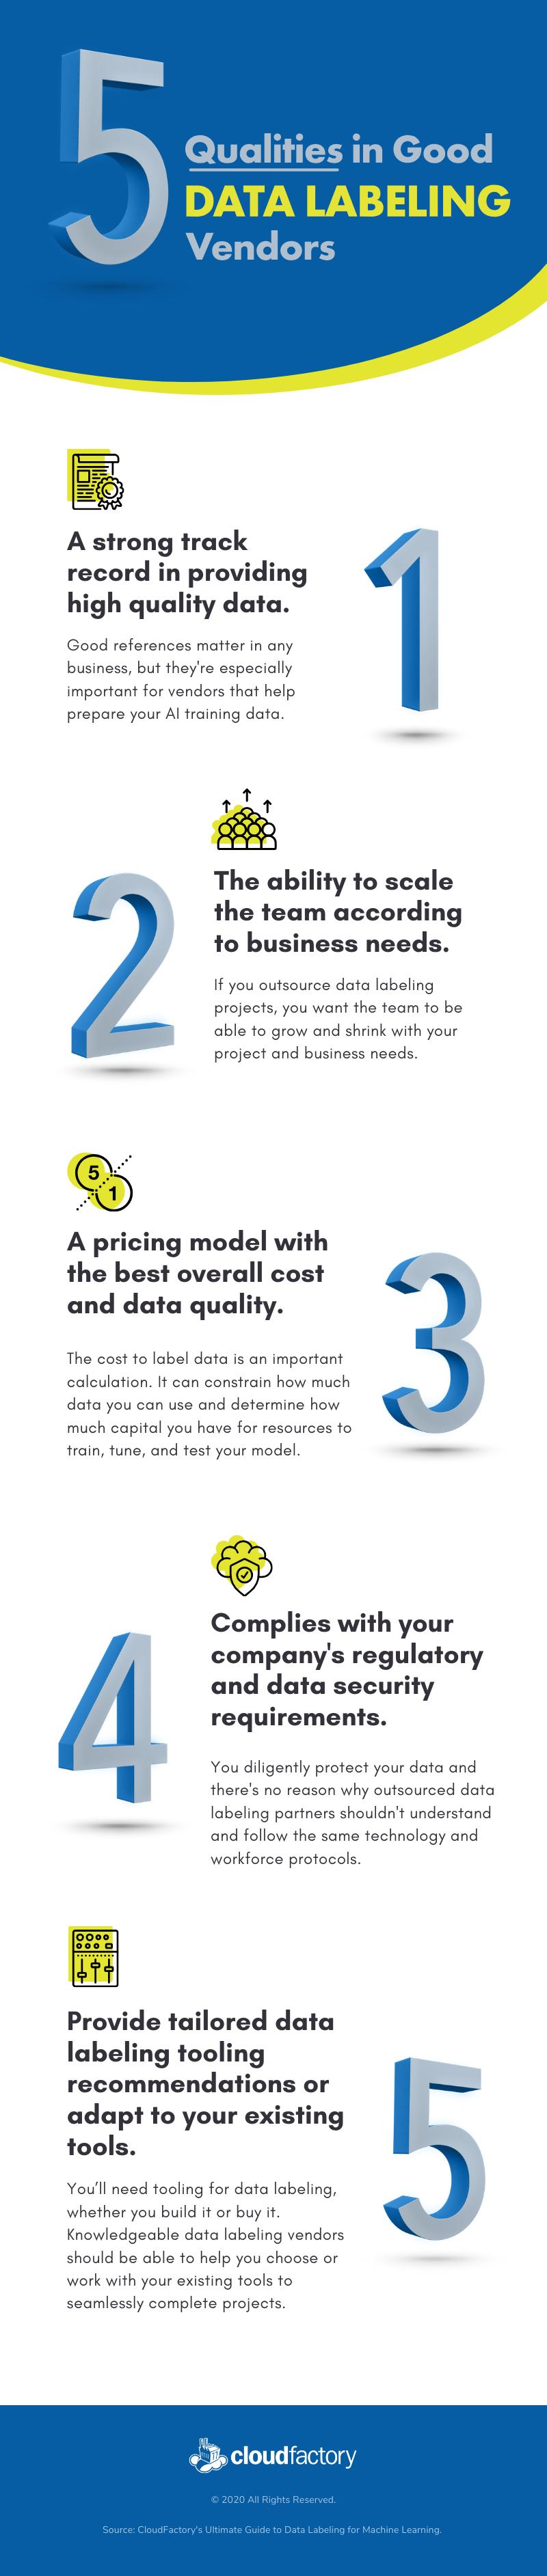 5 Qualities in Good Data Labeling Vendors